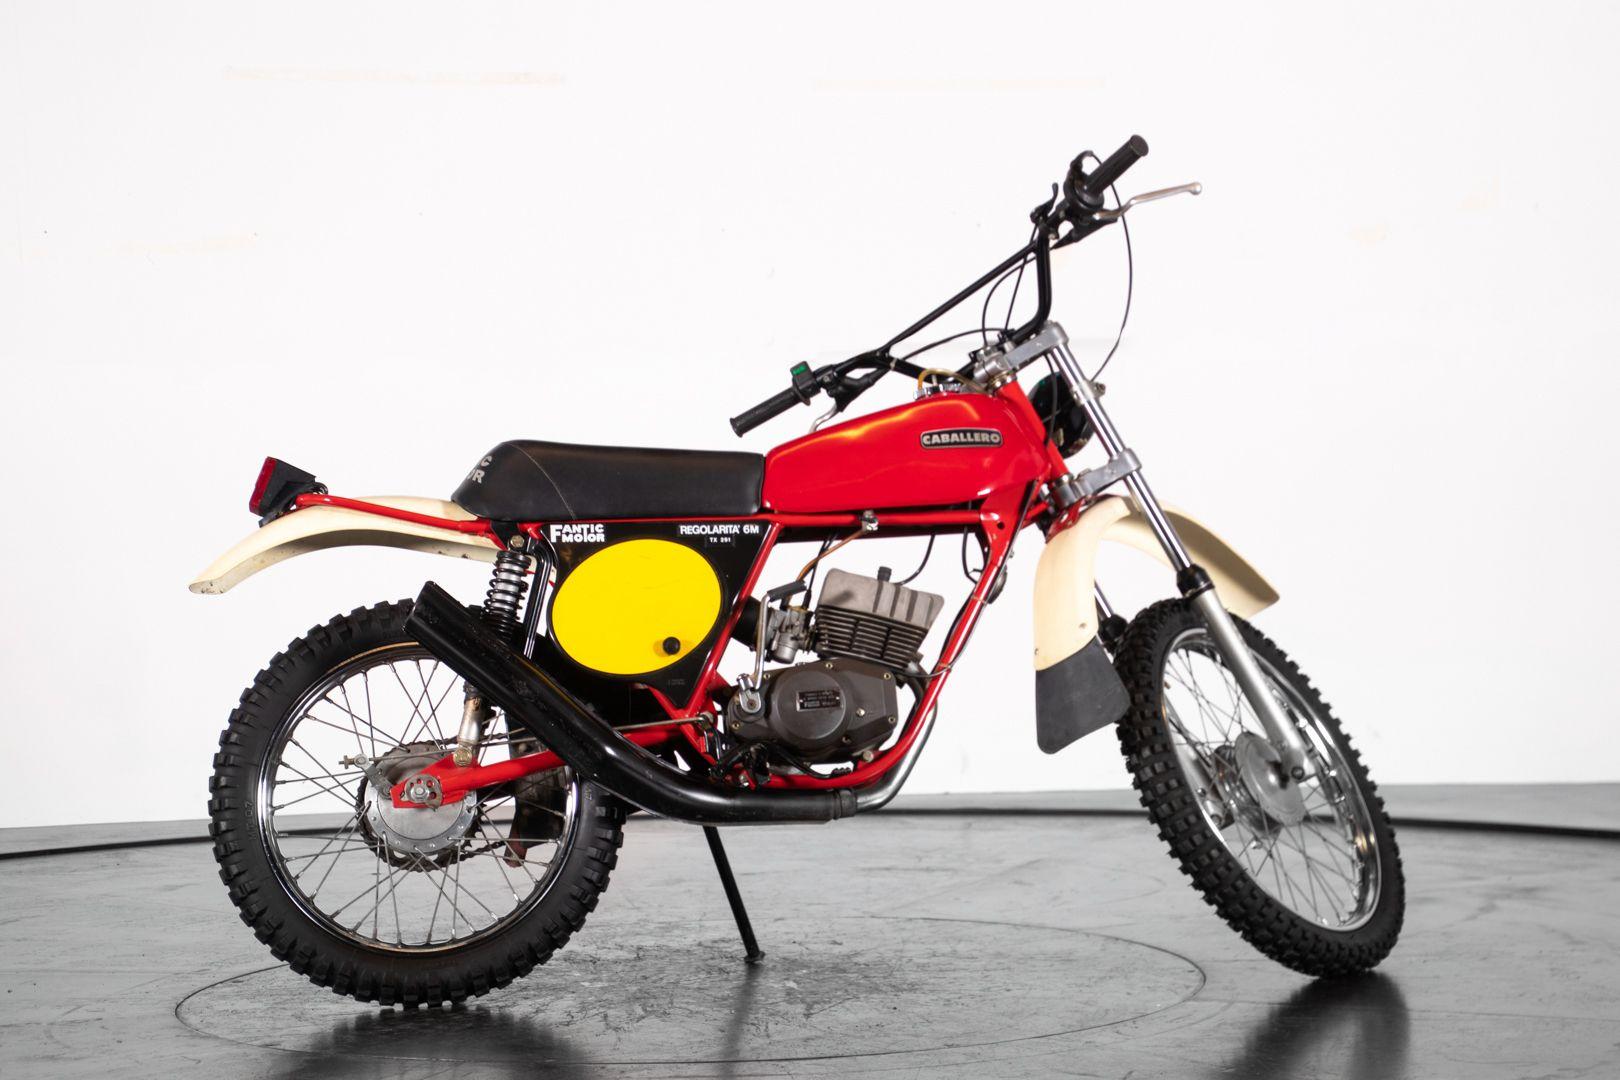 1979 FANTIC MOTOR TX 291 49342